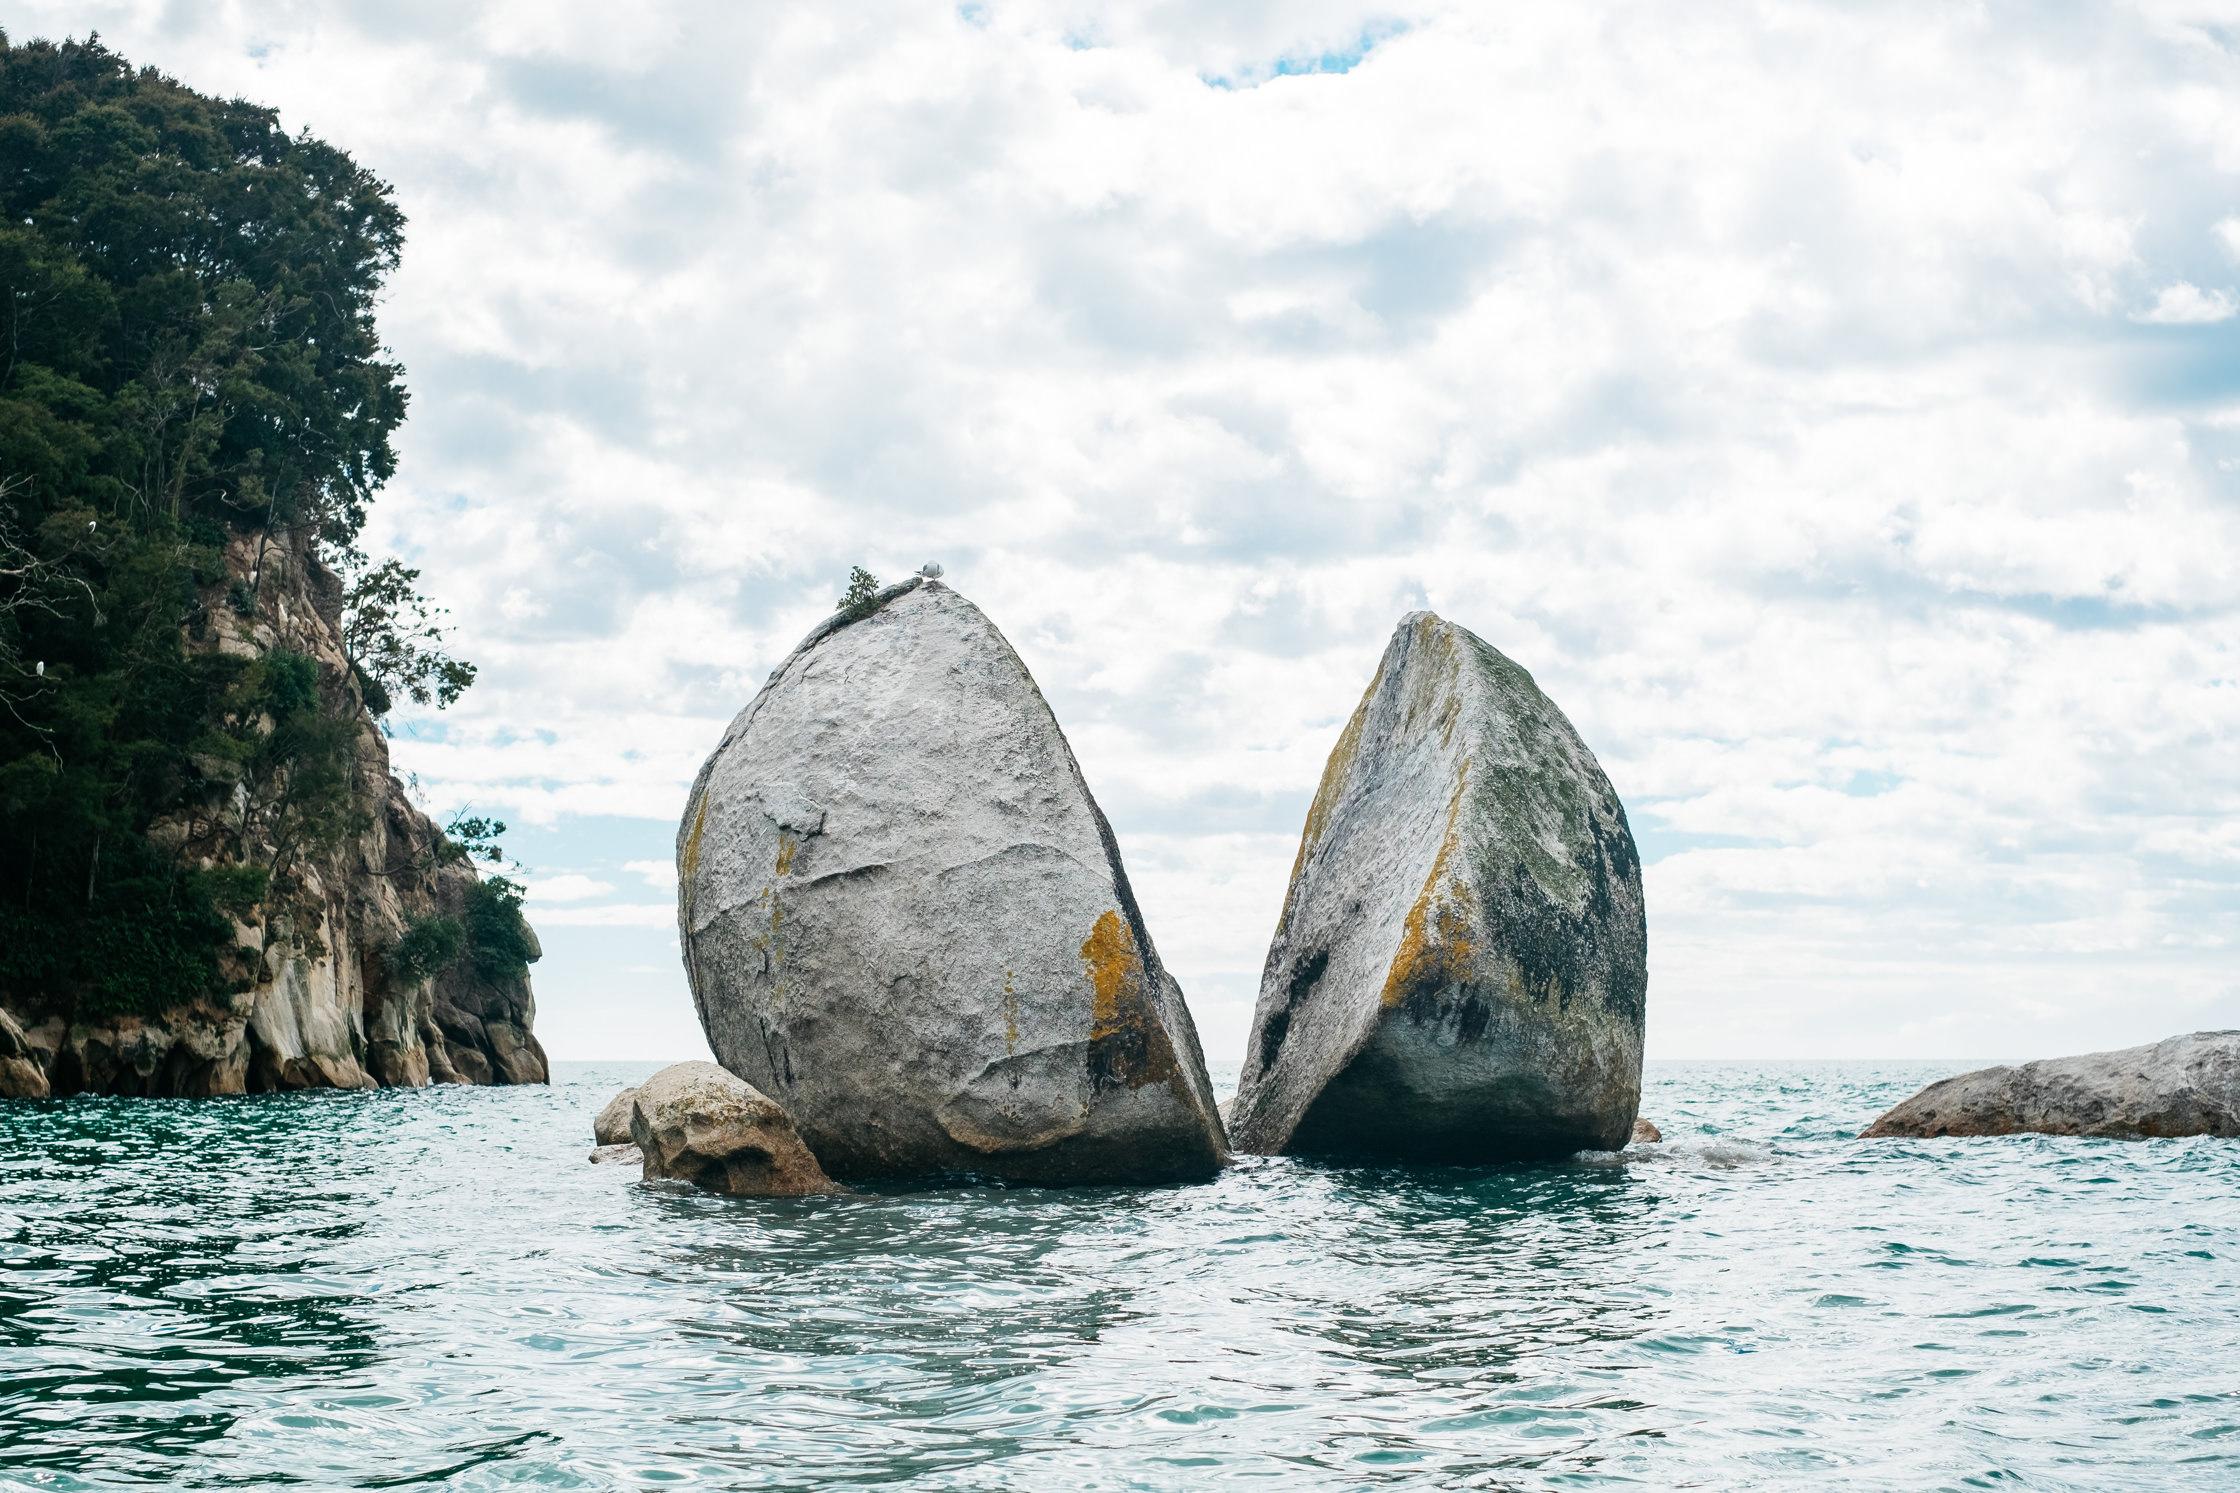 слова картинка море камень лодка приметы шипр